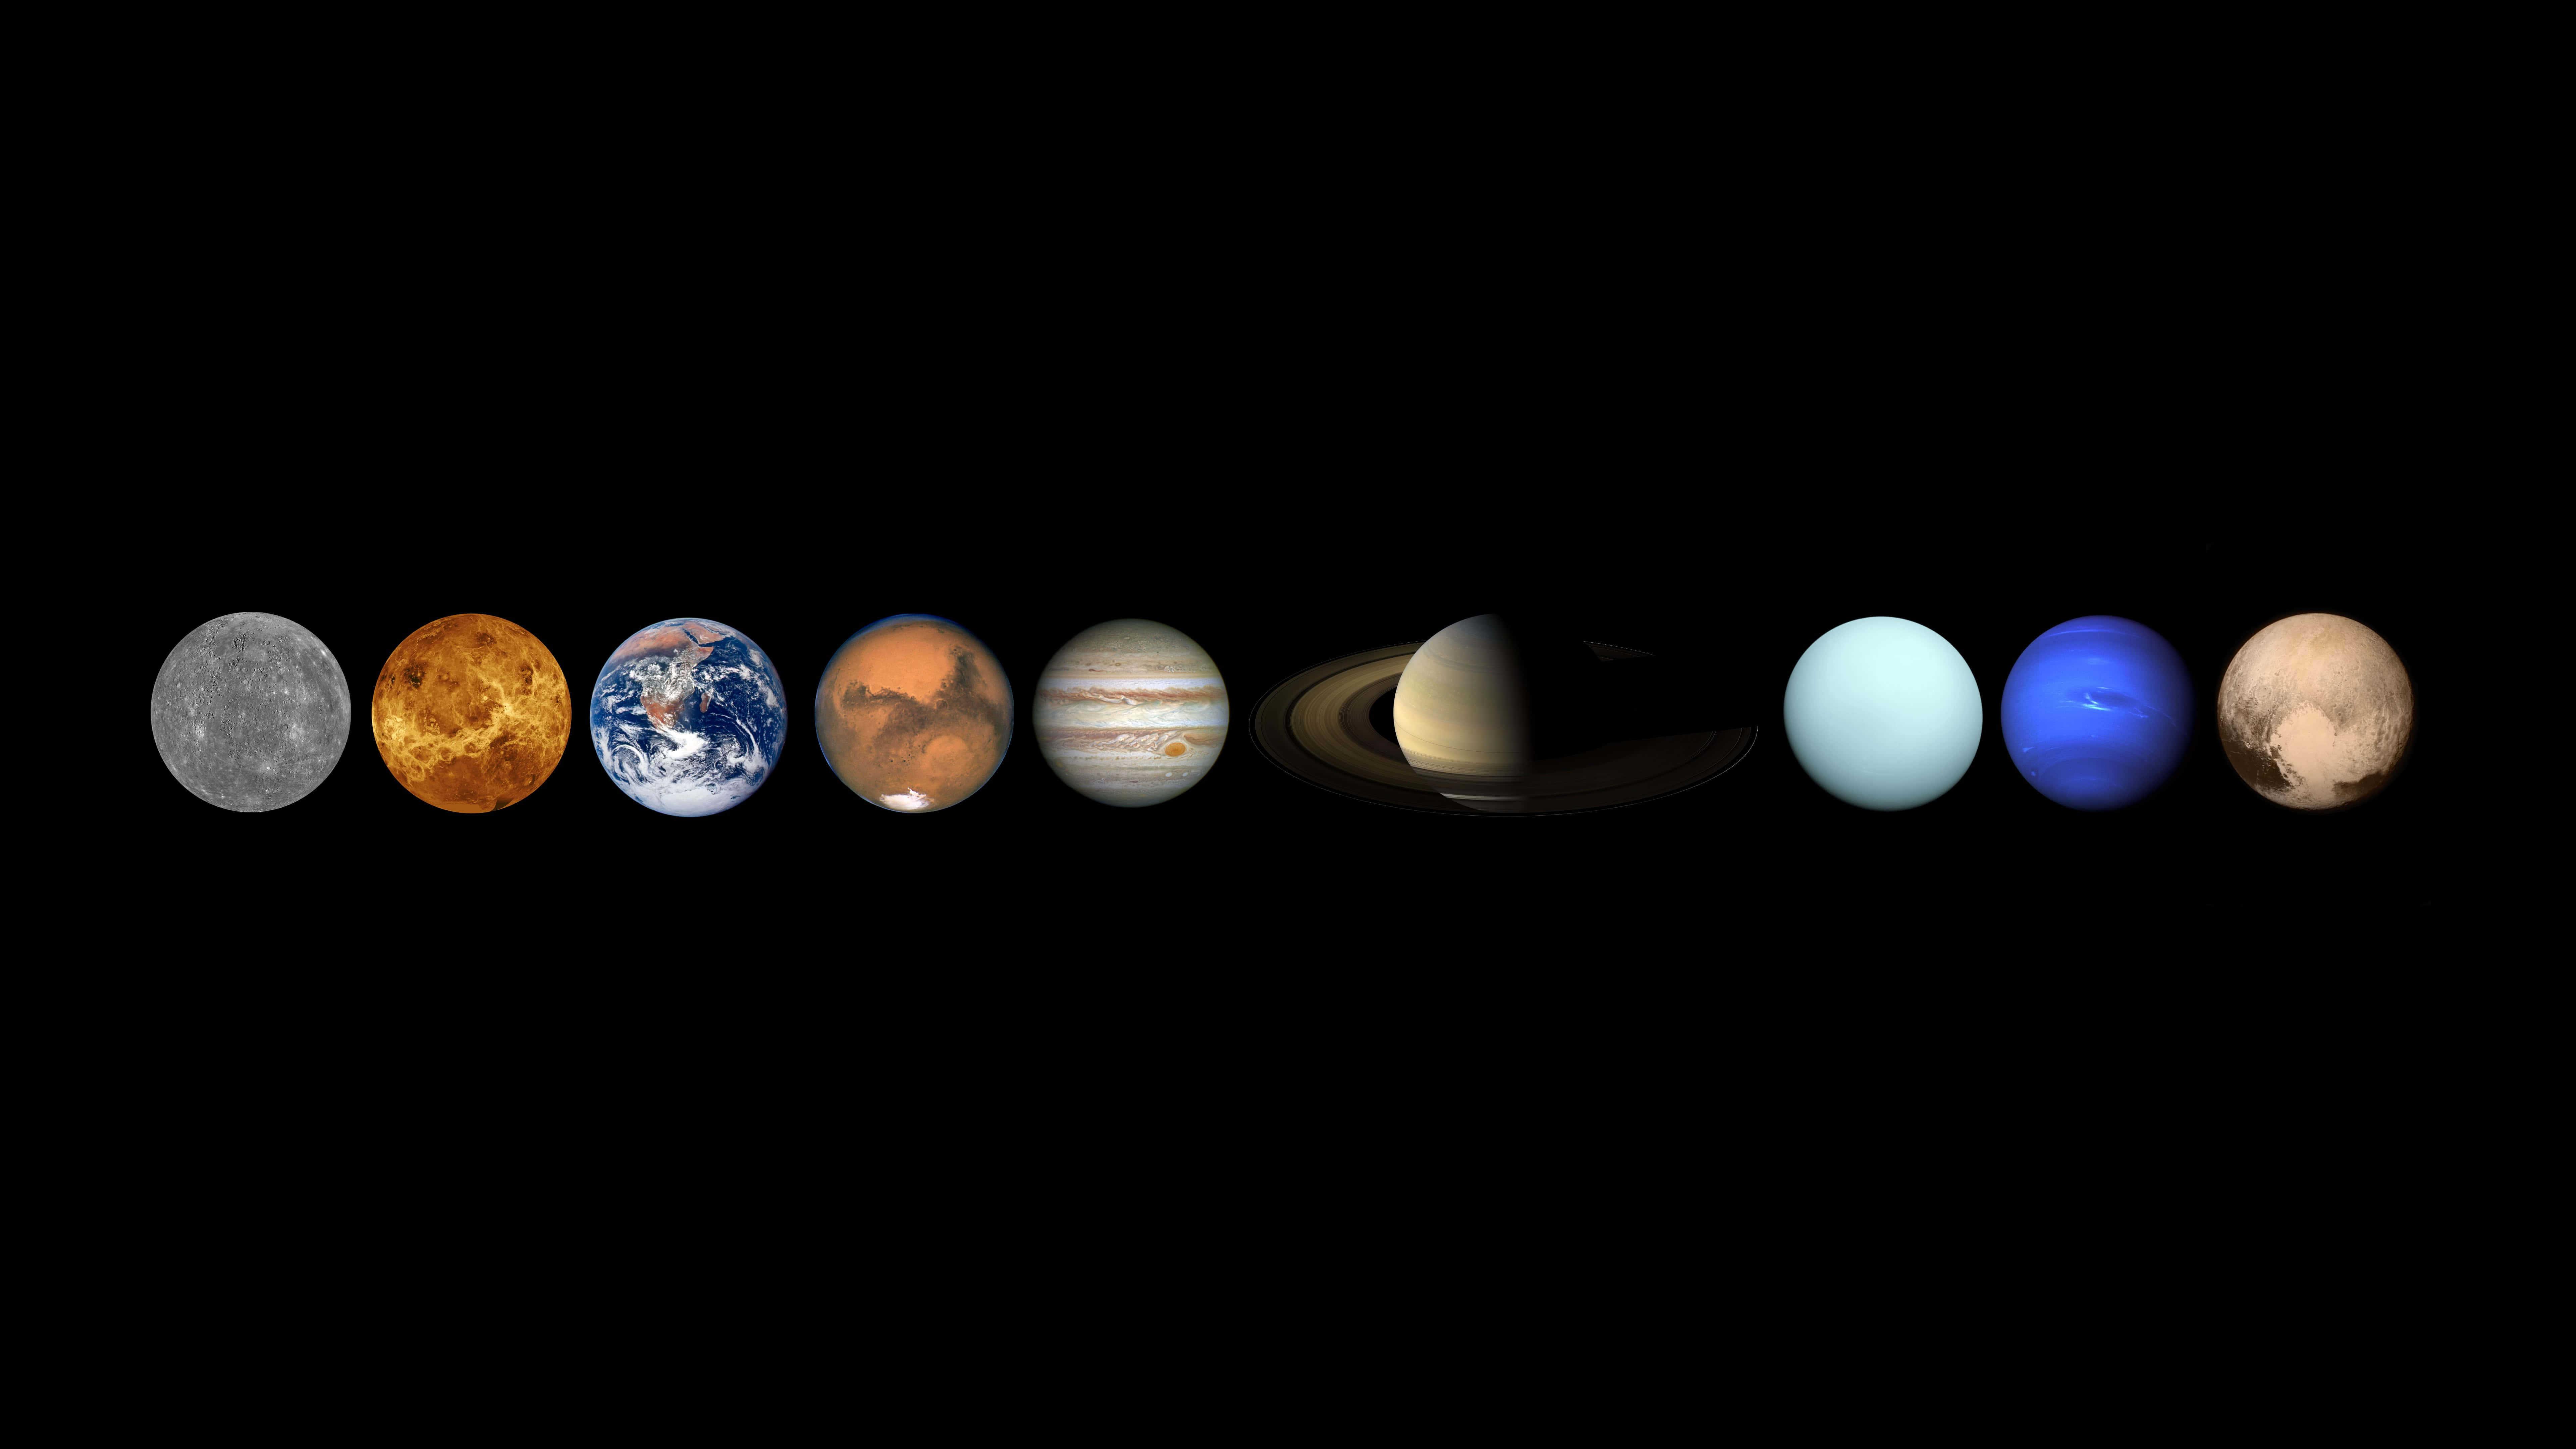 7680x4320 الكواكب في نظامنا الشمسي خلفية UHD 8K